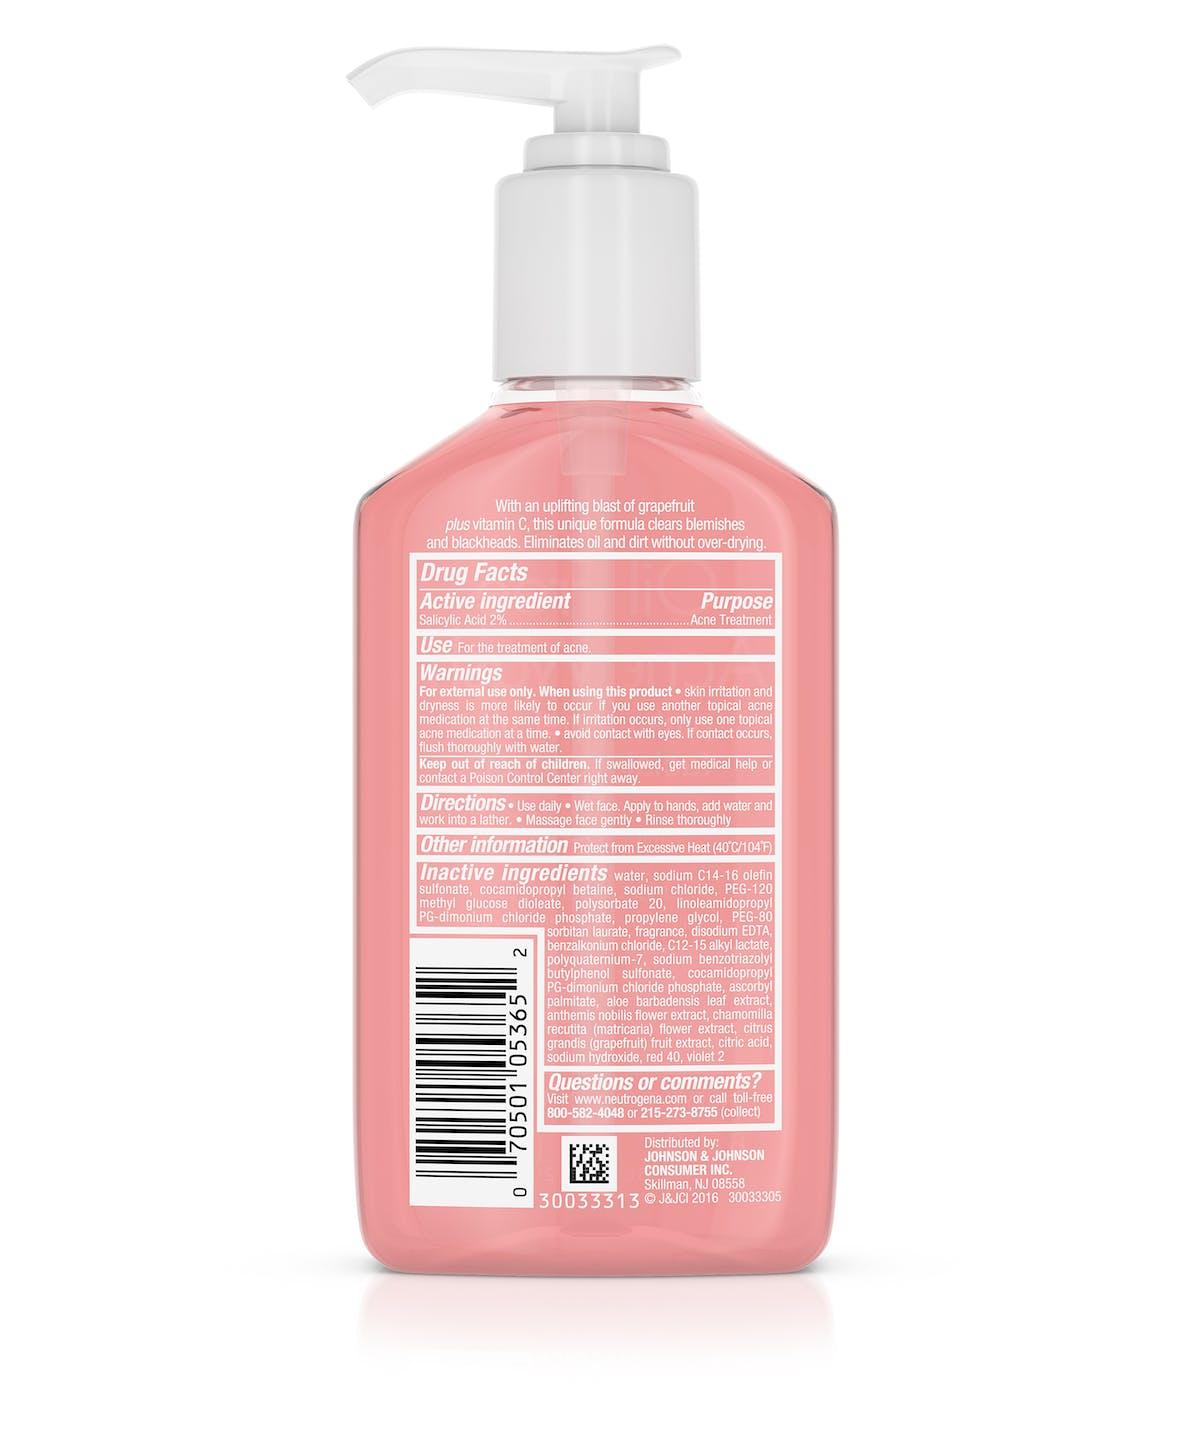 c699b9a66e Oil-Free Acne Wash Pink Grapefruit Facial Cleanser